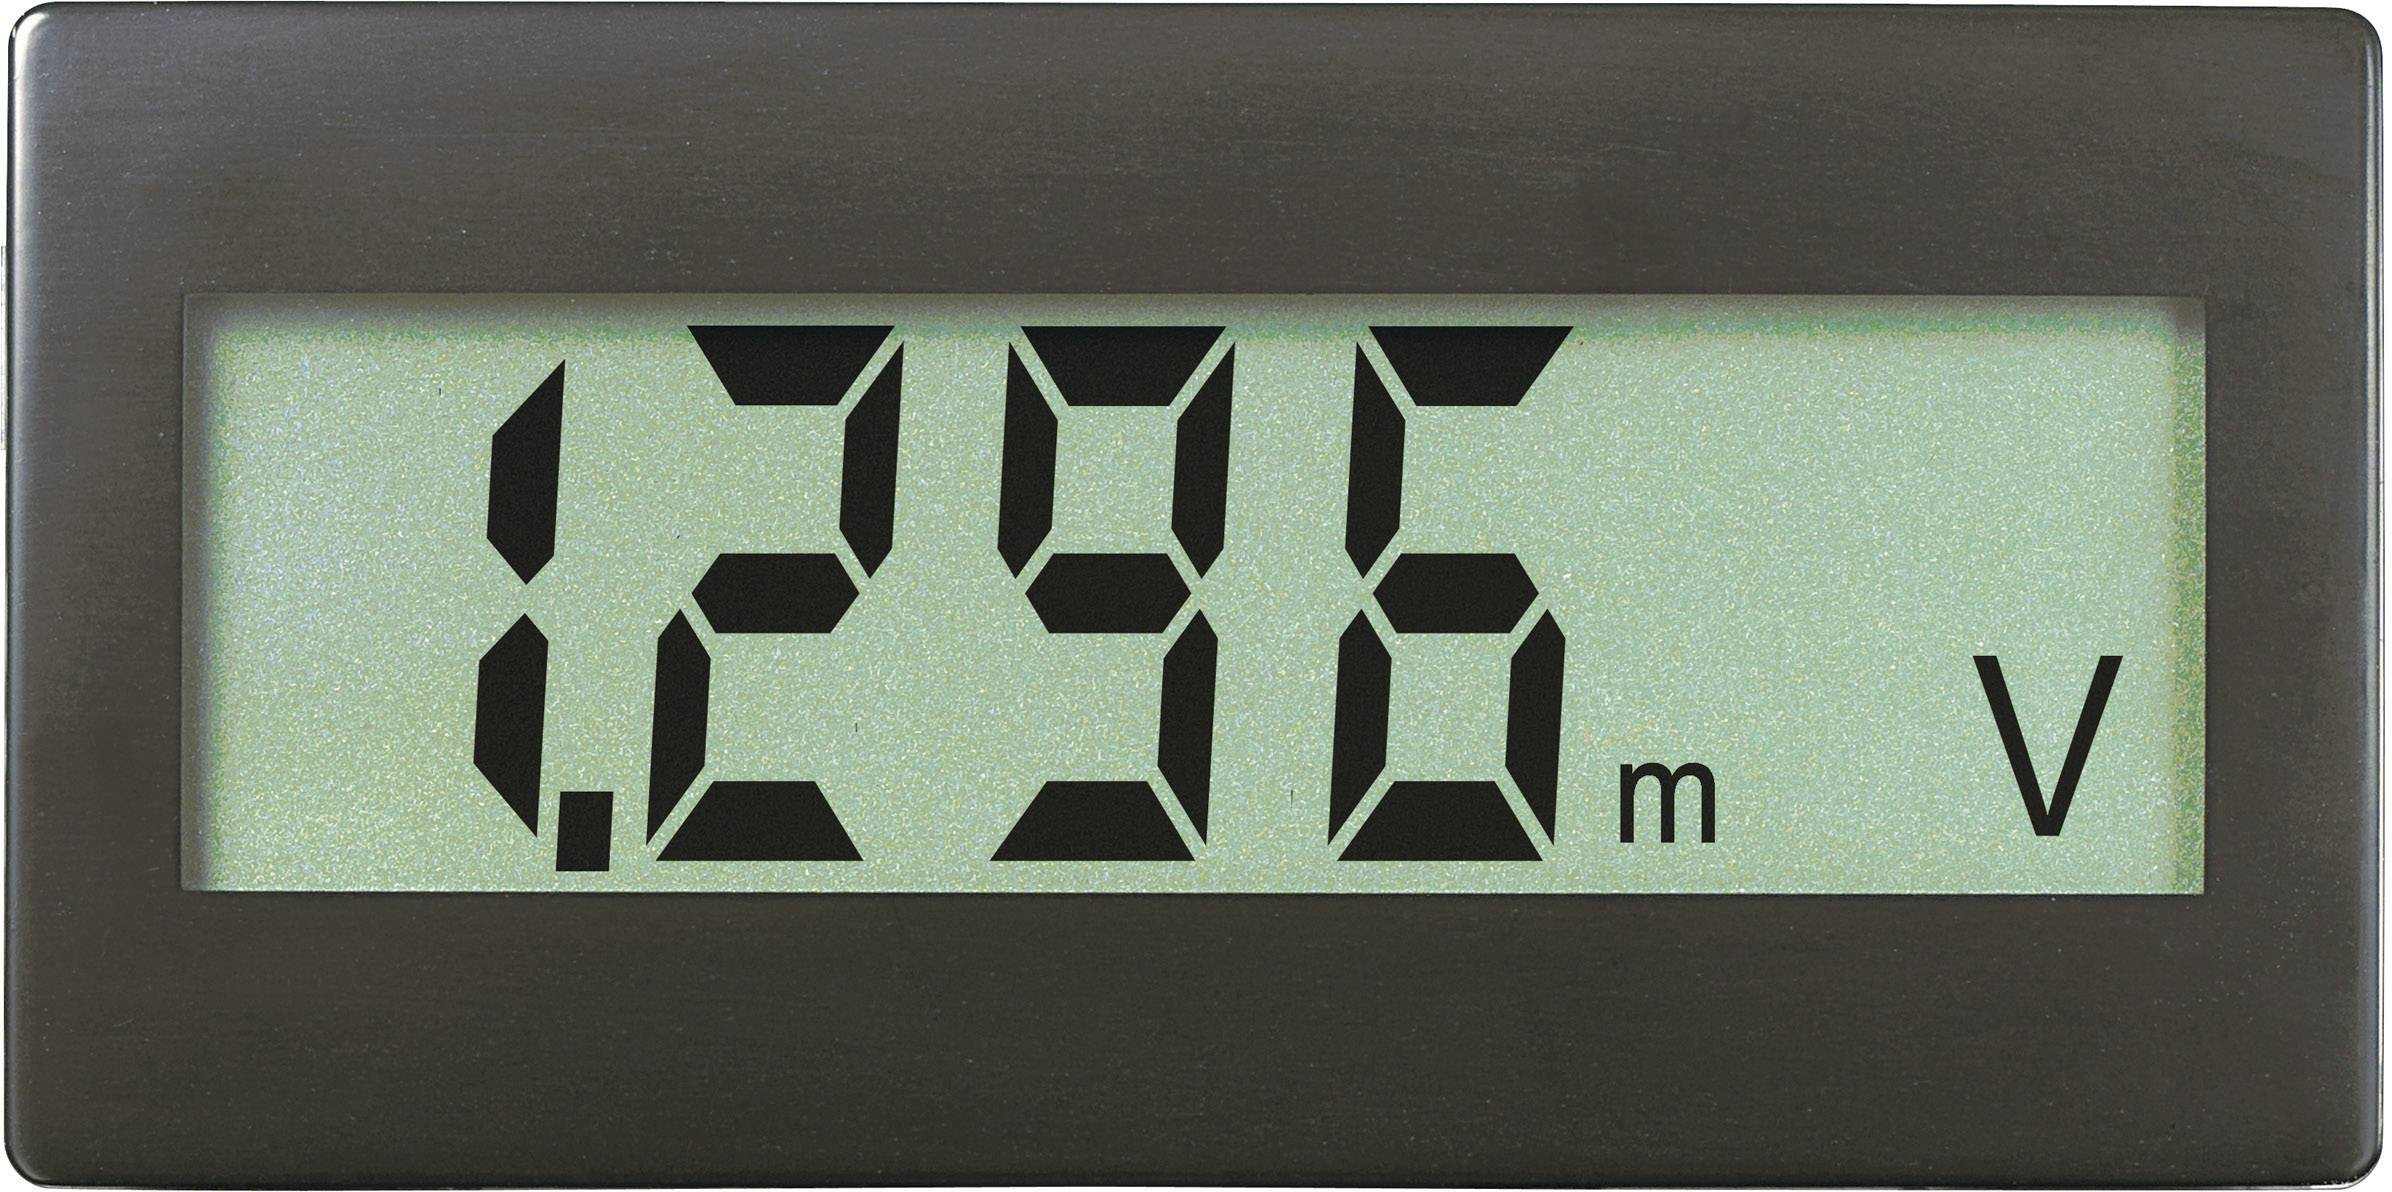 Digitálne panelové meradlo Voltcraft DVM-230G, 45 x 22 mm